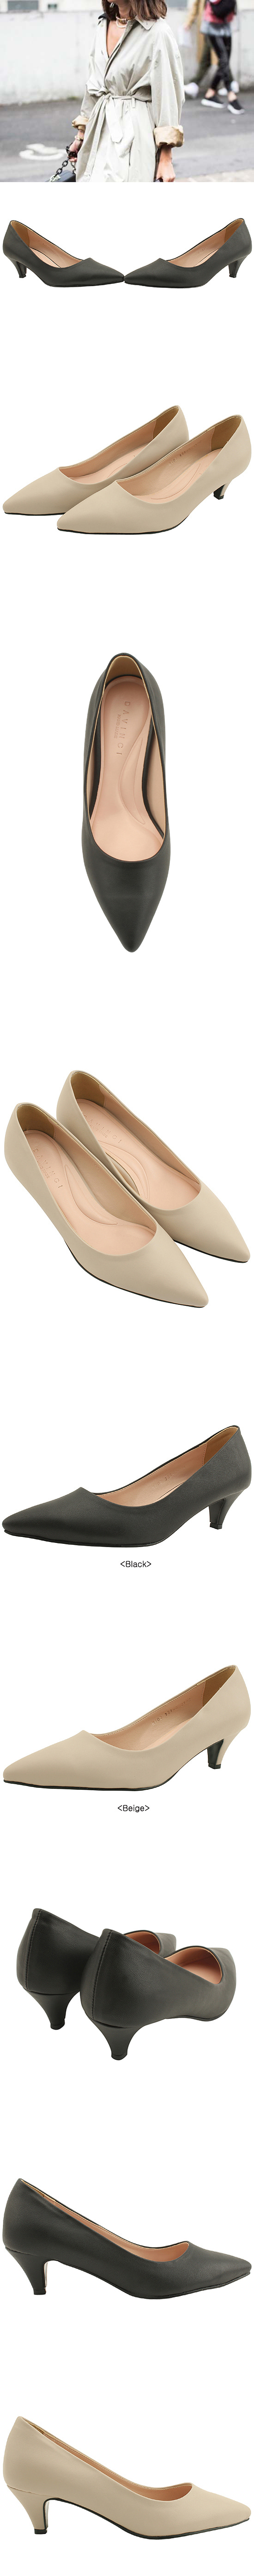 Simple Line Stiletto Middle Heel 5cm Black